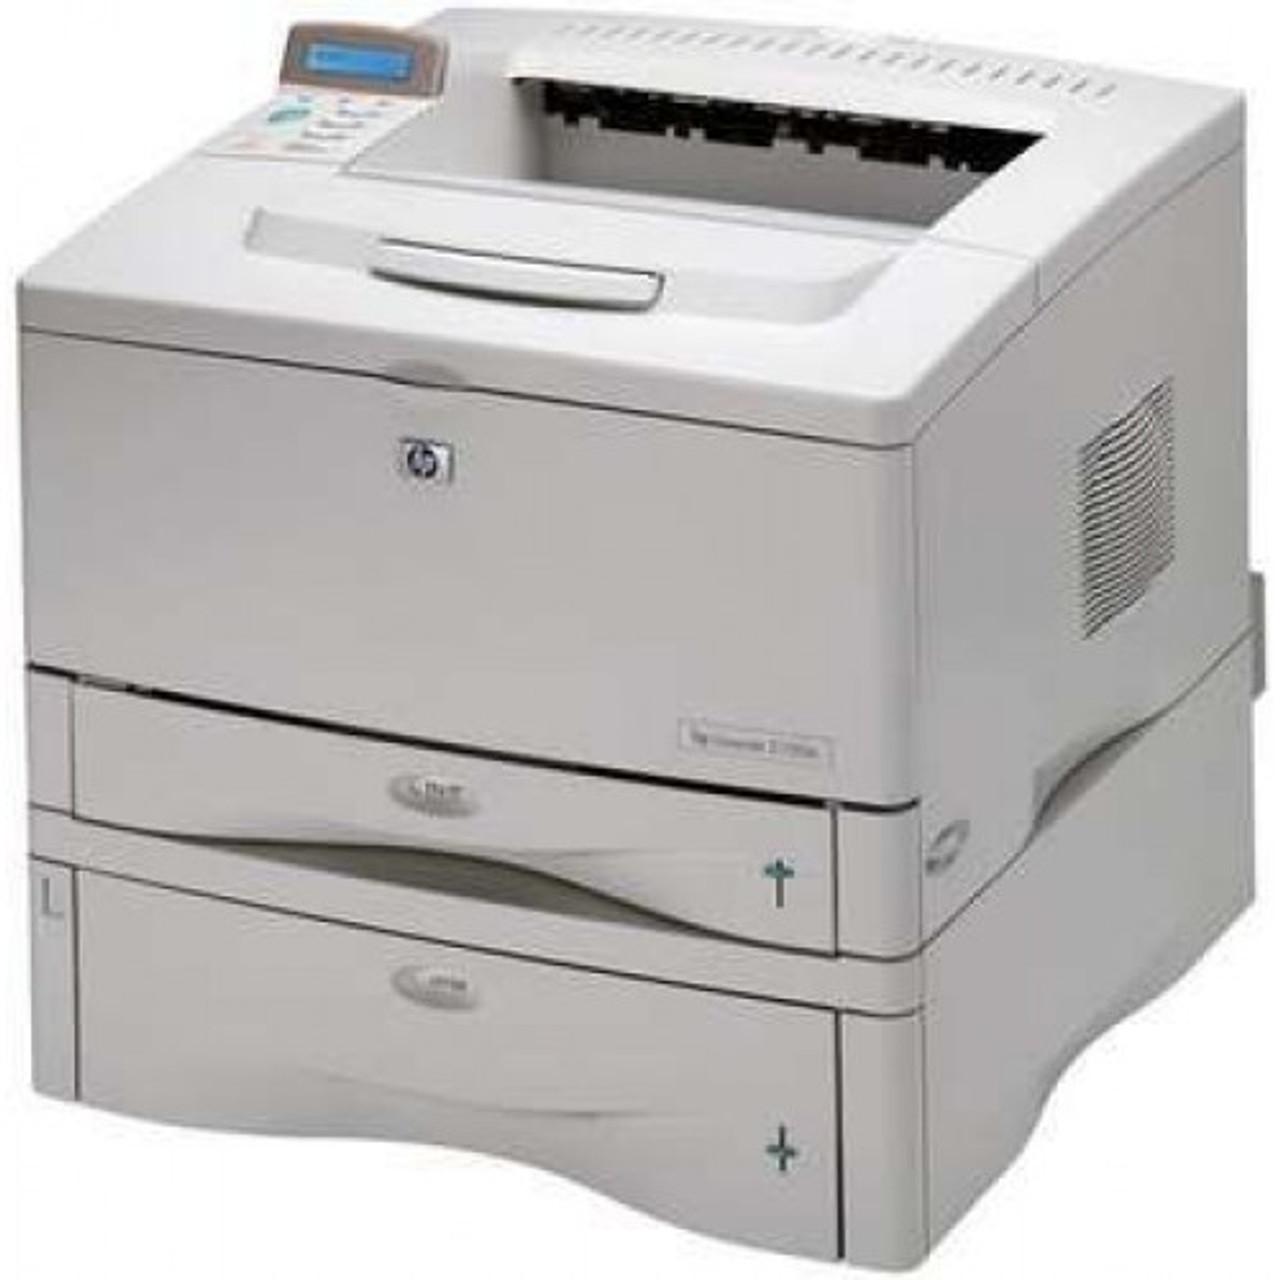 HP LaserJet 5100tn - q1861a - HP 11x17 Laser Printer for sale